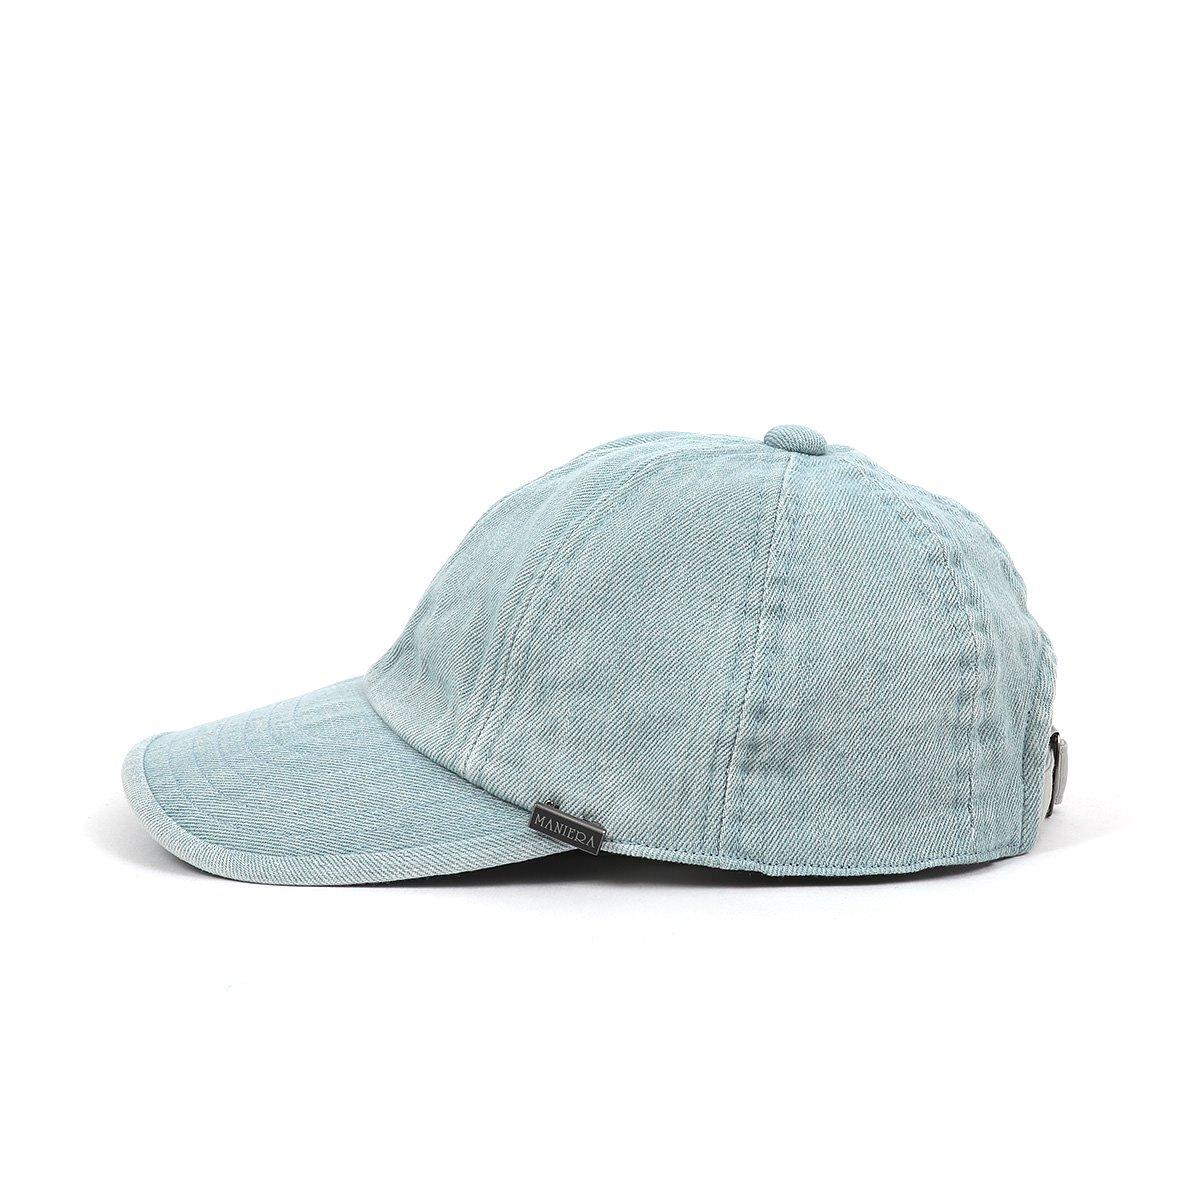 INDIGO 8PANEL CAP 詳細画像2